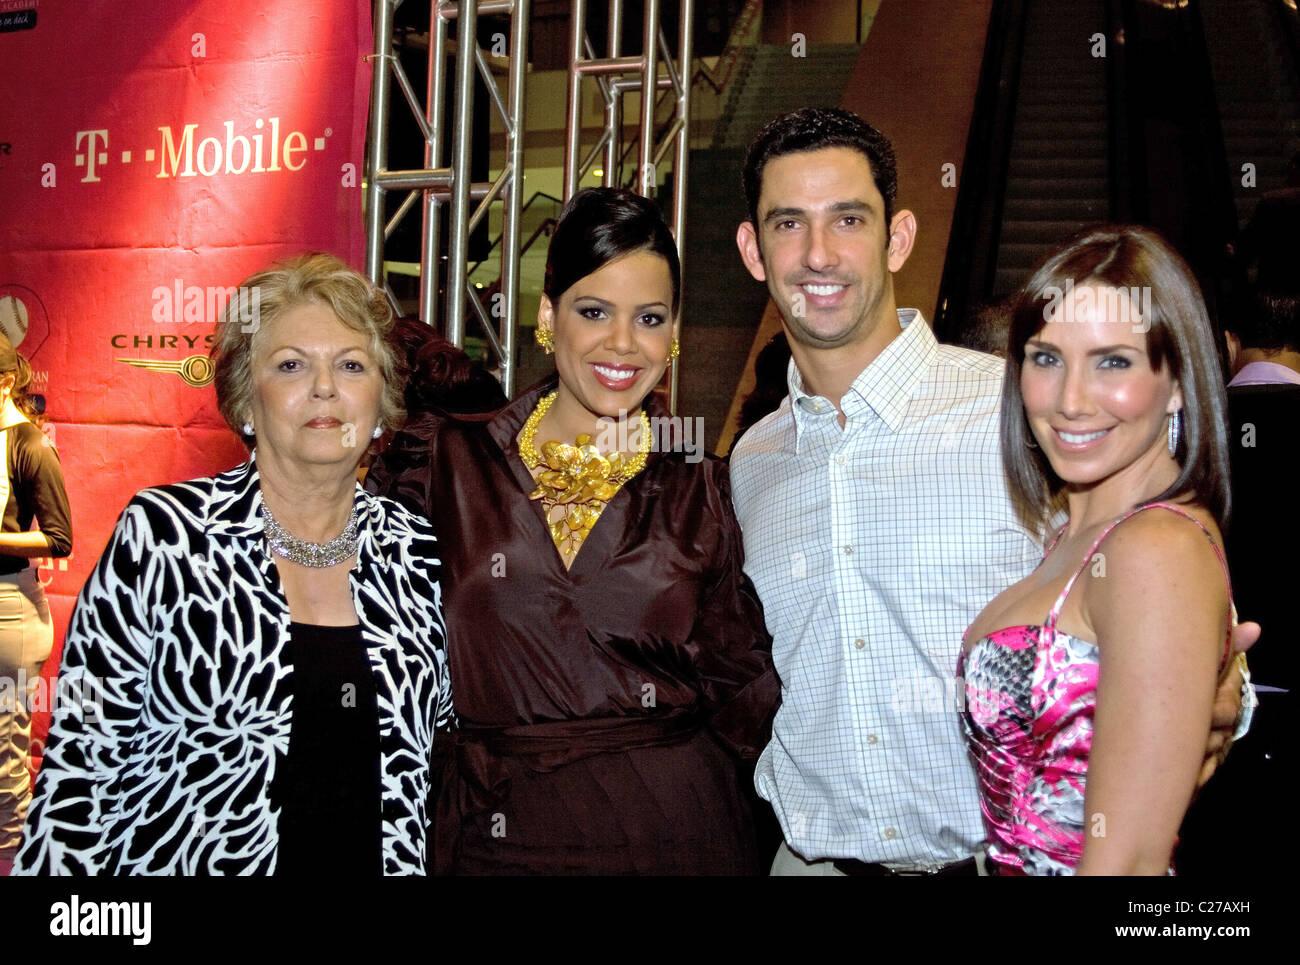 Jessica Beltran Jorge Posada And Laura Posada With Her